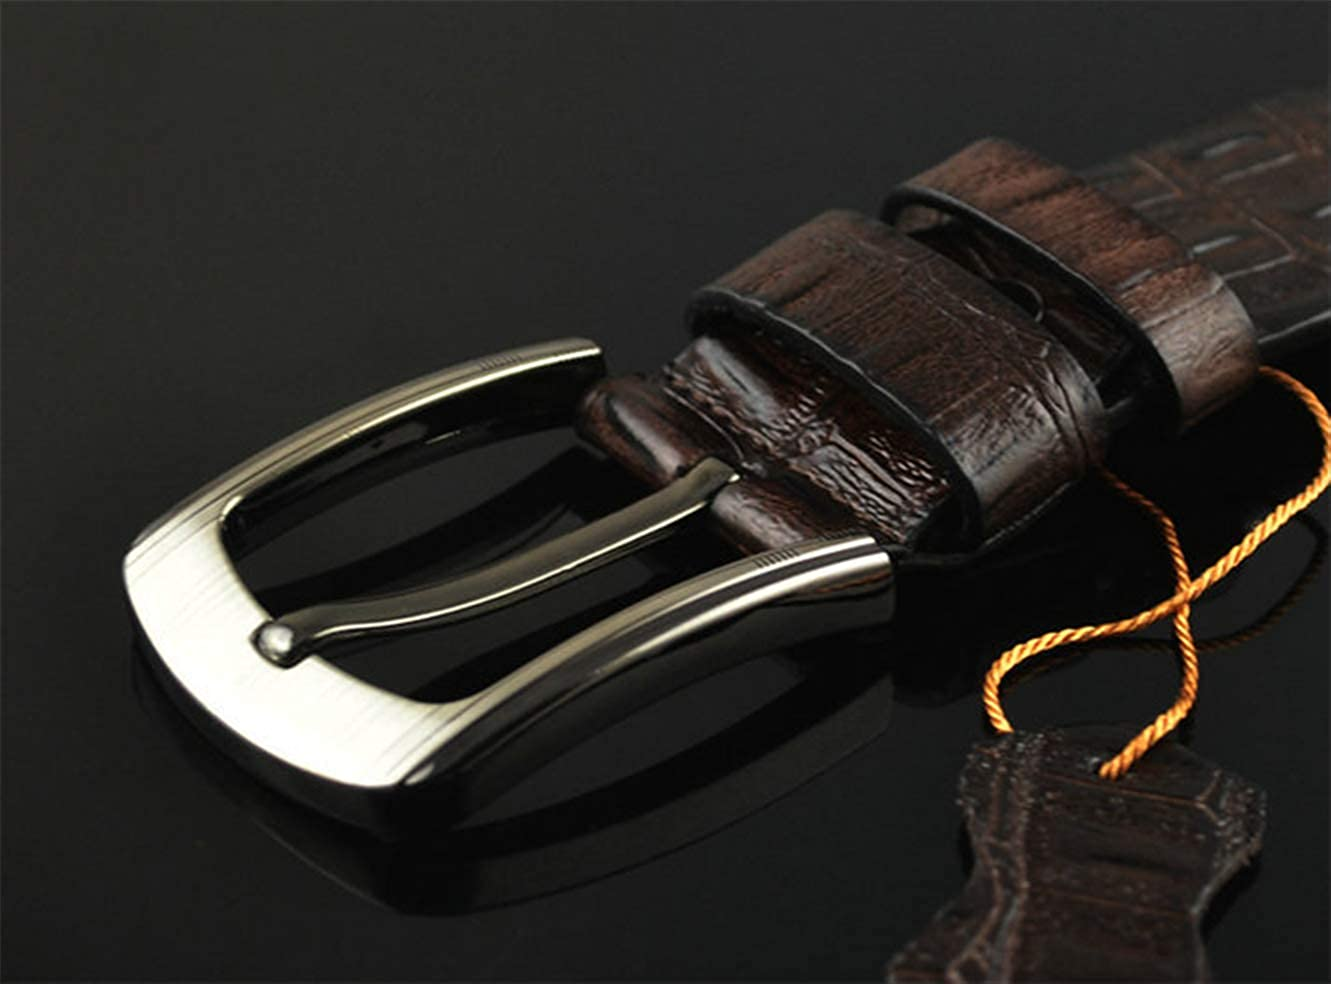 Pin buckle belt mens belt leisure belt leather belt